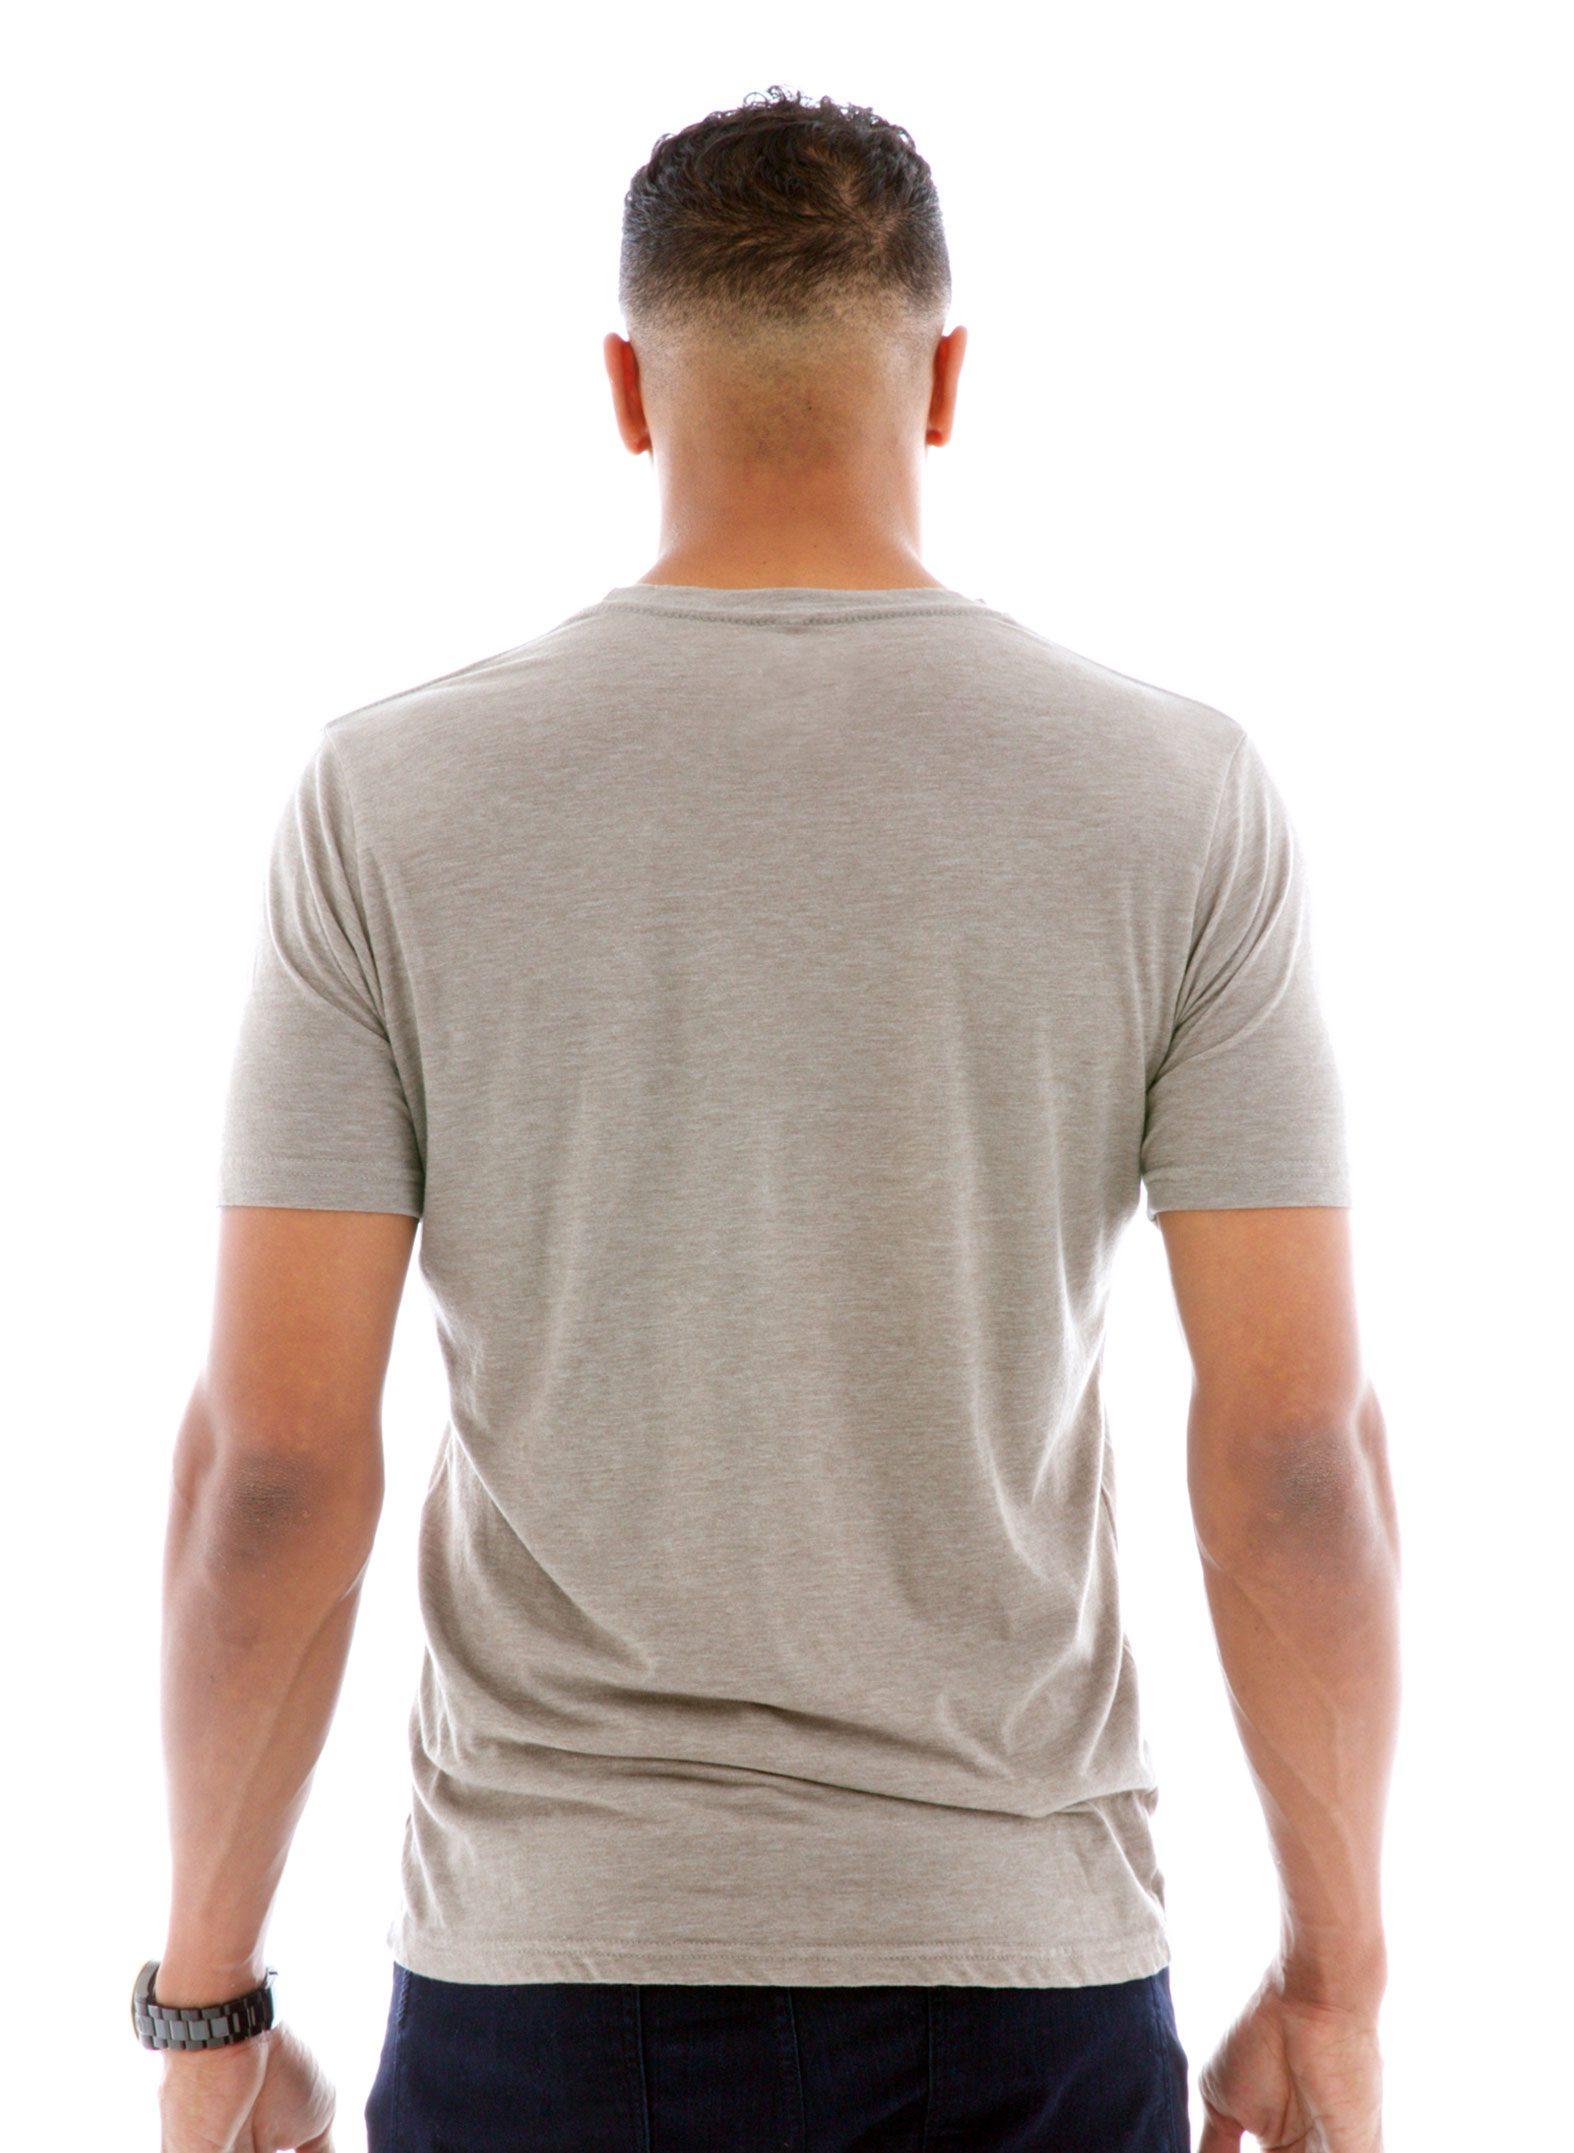 Heathered Crew Short Sleeve T-Shirt Back View